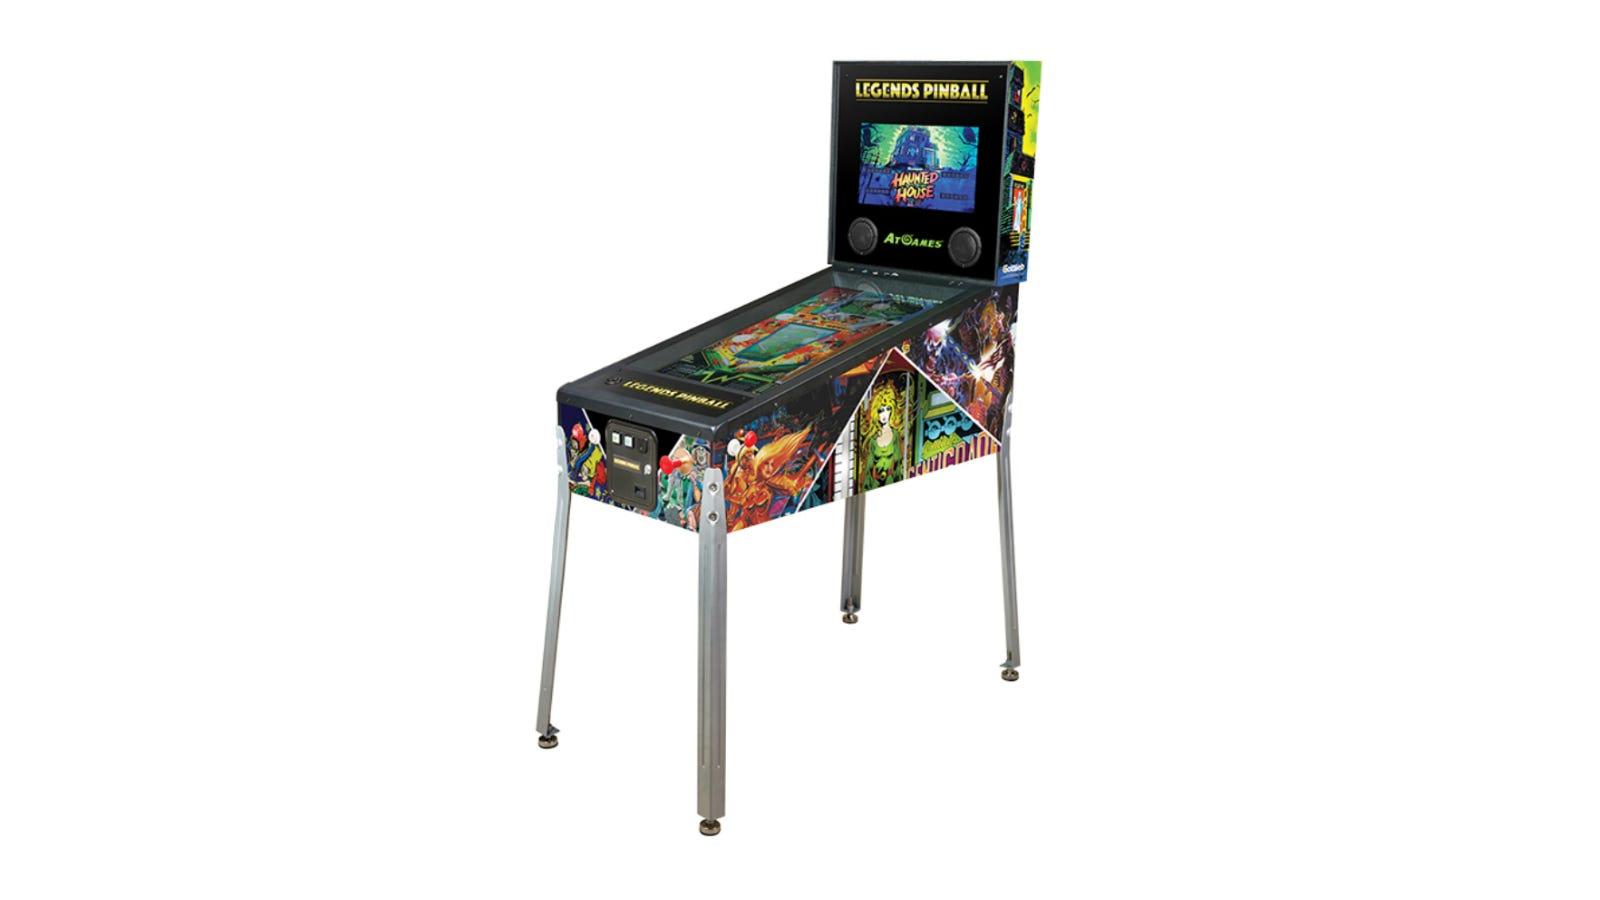 AtGames Legends Pinball machine